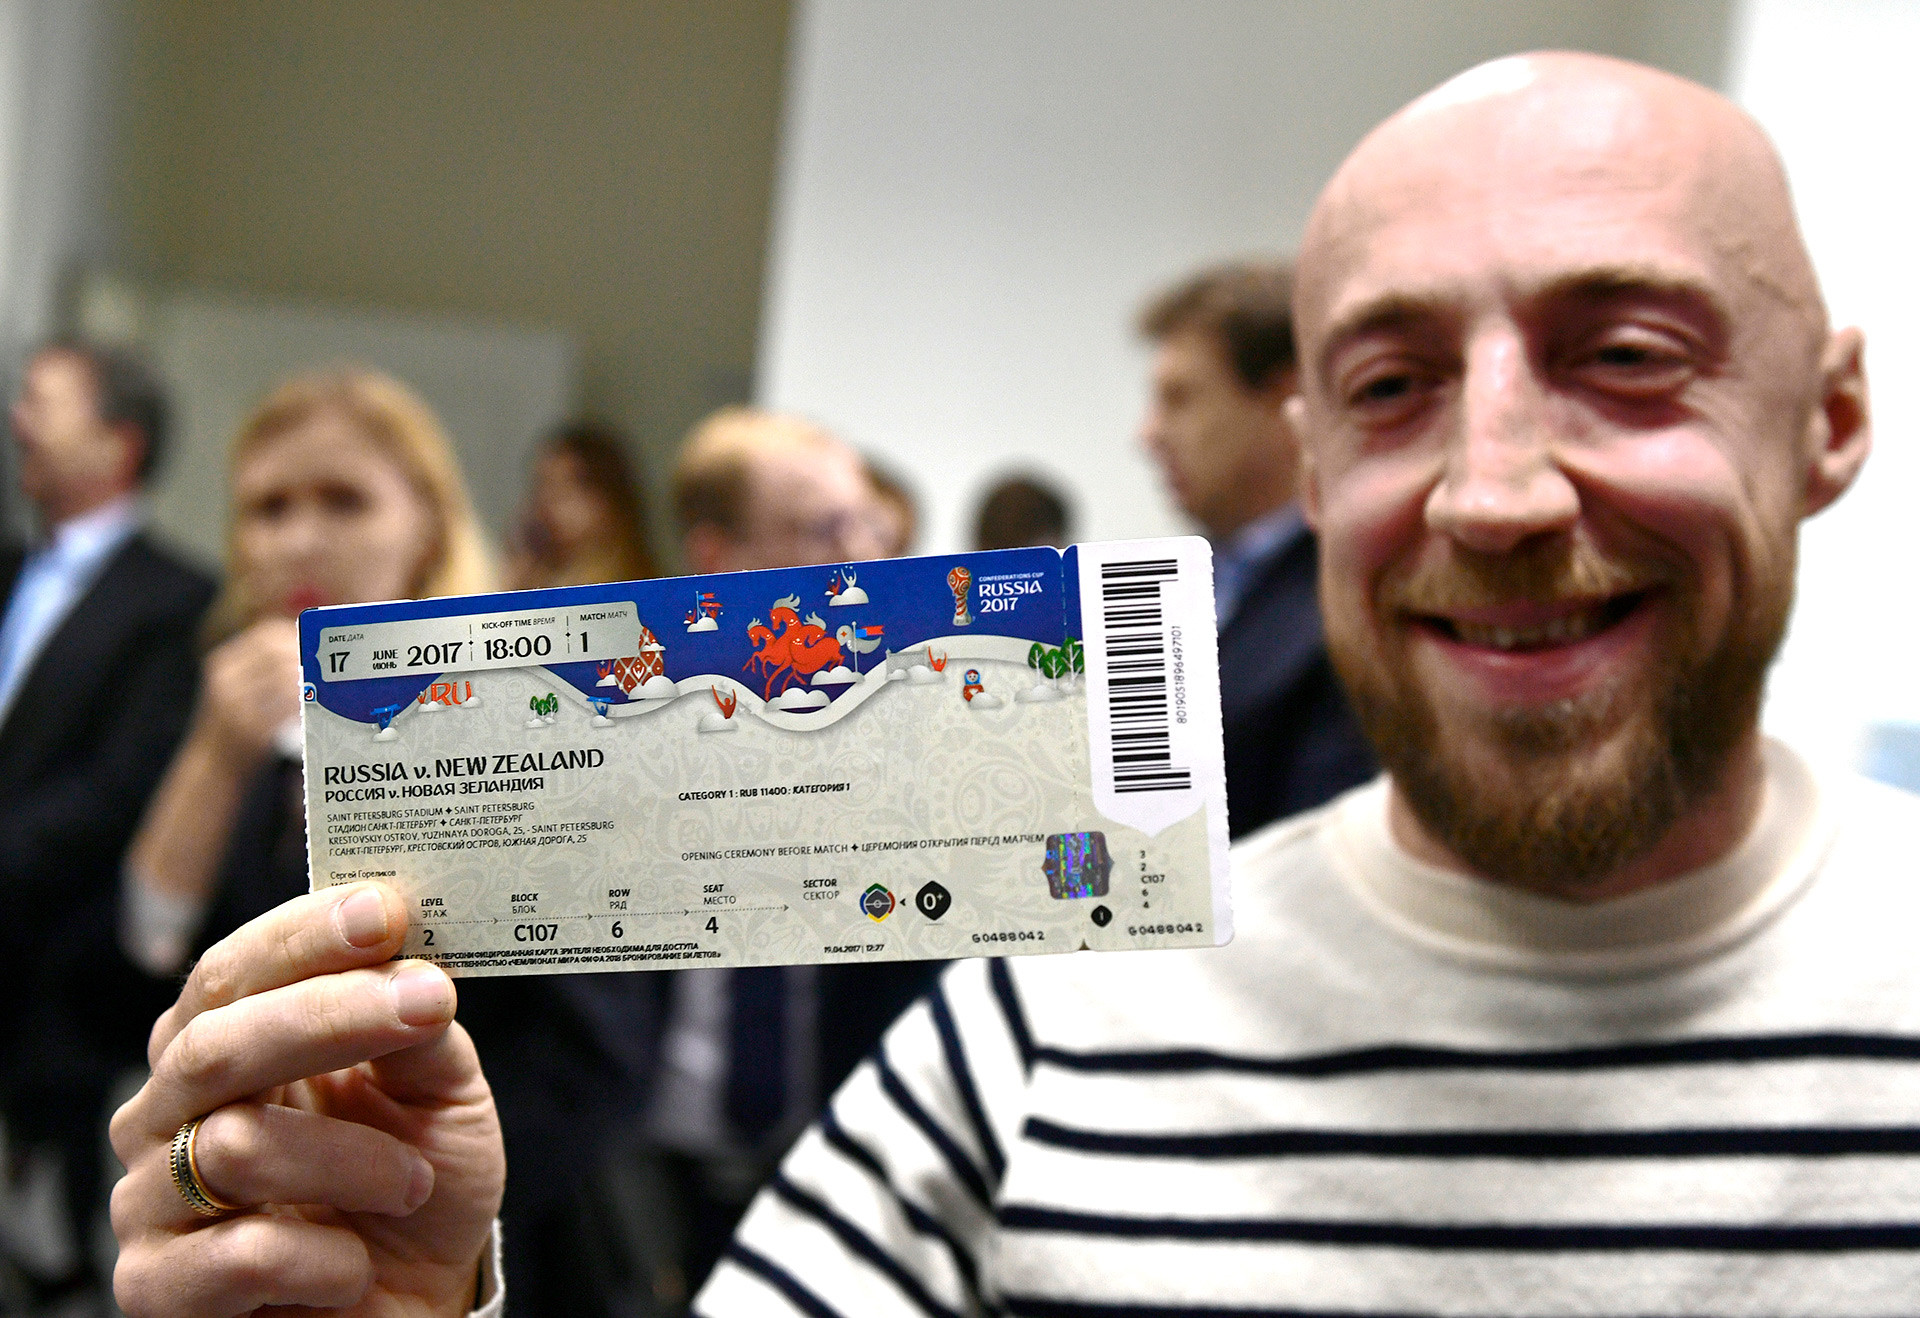 Pembukaan loket tiket utama Piala Dunia.